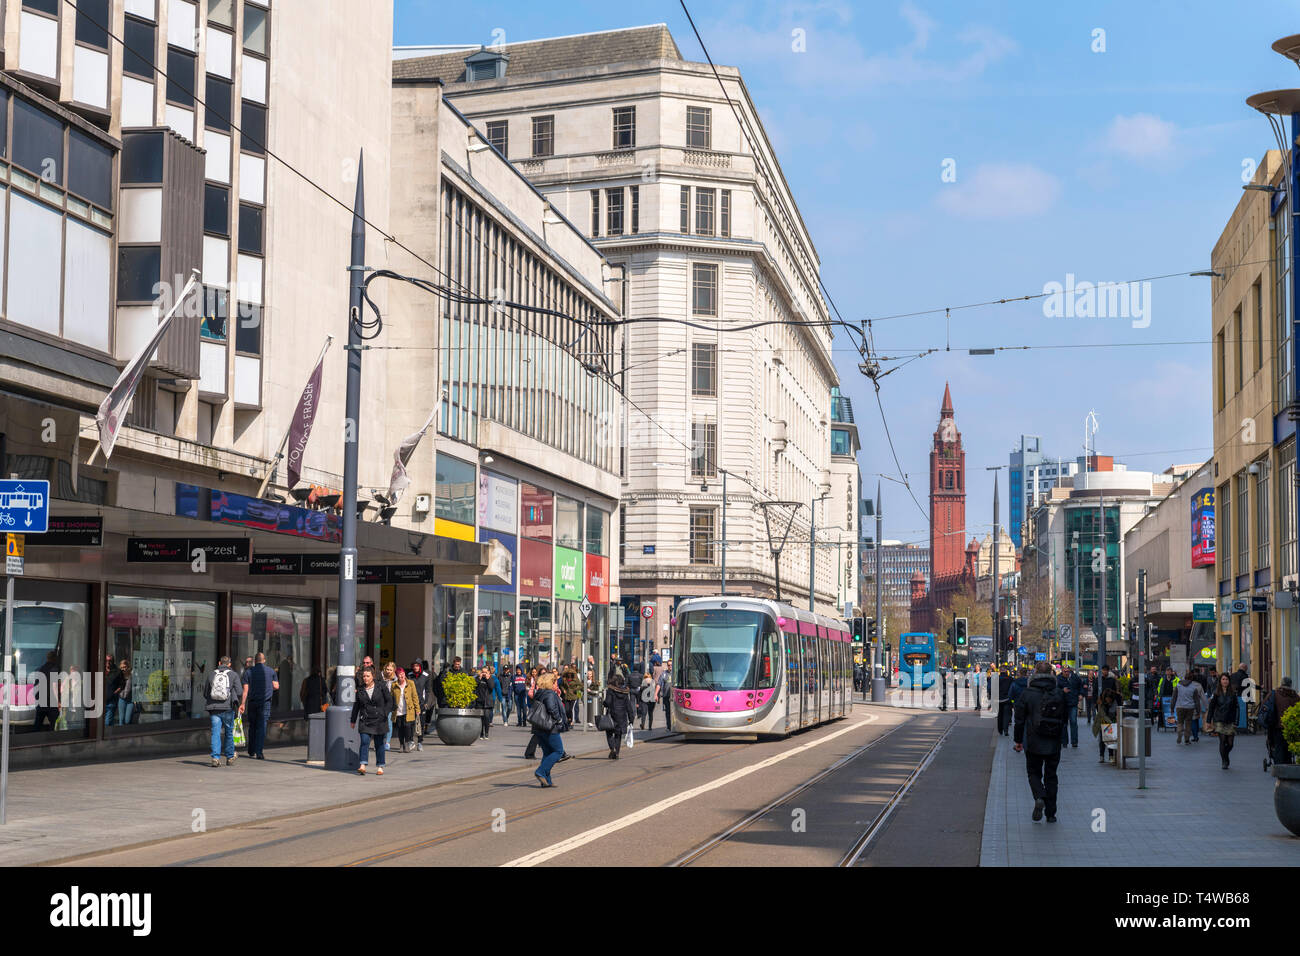 West Midlands Metro tram on Corporation Street in Birmingham, West Midlands, England, UK - Stock Image